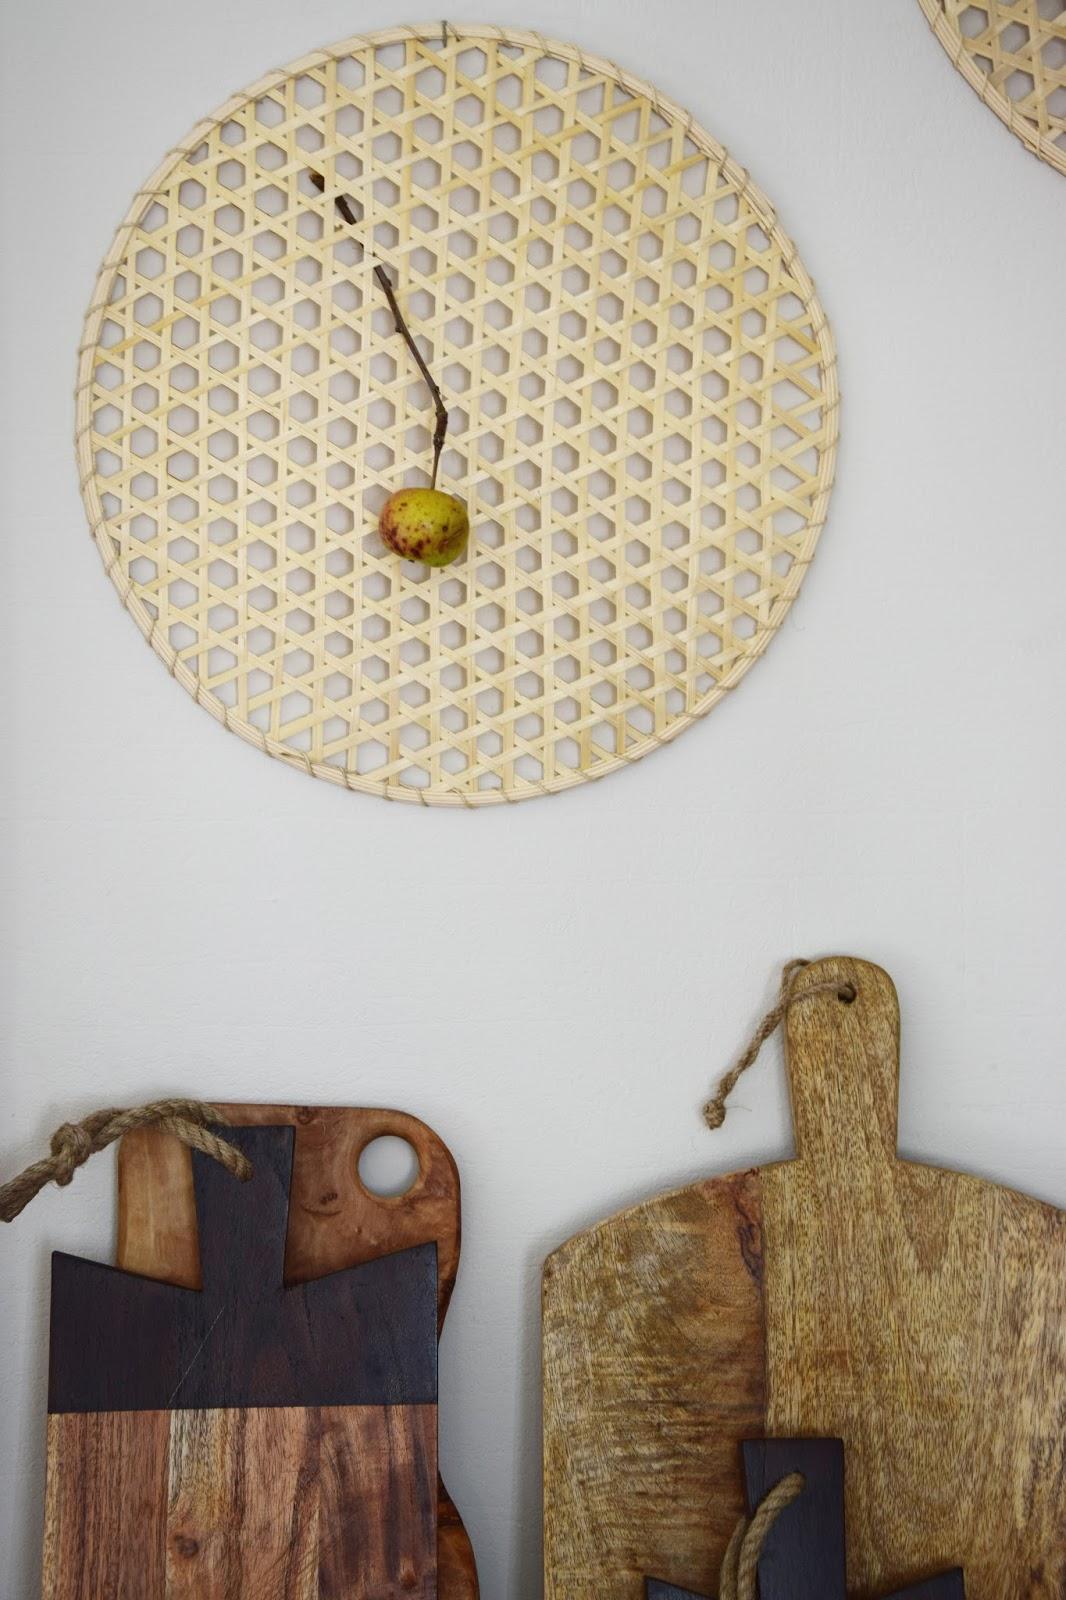 vom tisch an die wand deko mal anders eclectic hamilton. Black Bedroom Furniture Sets. Home Design Ideas